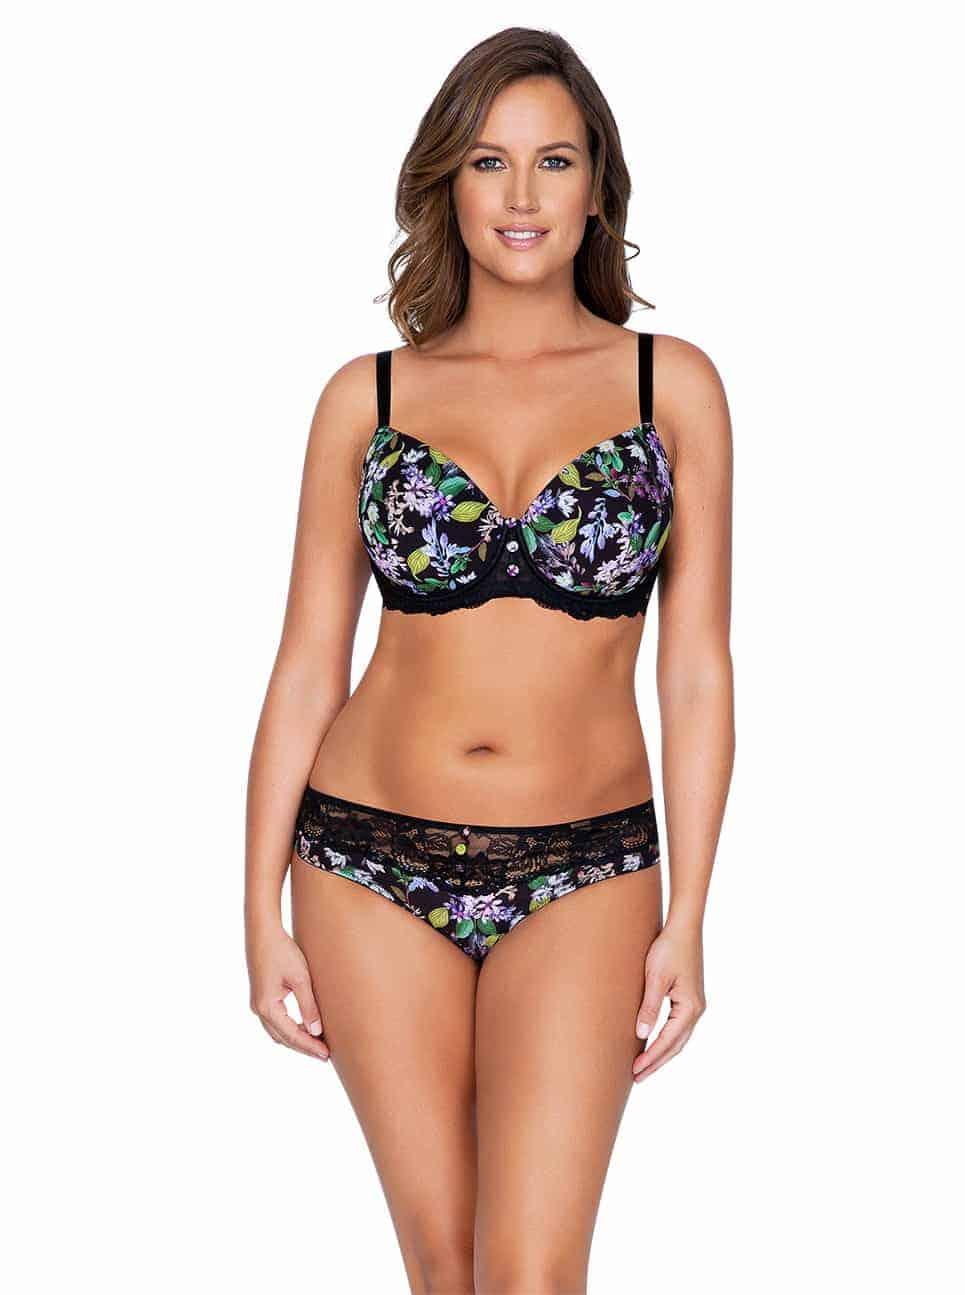 Ava P5371 PaddedBra P5373 BikiniFront - Ava Padded Bra - Black Floral - P5371